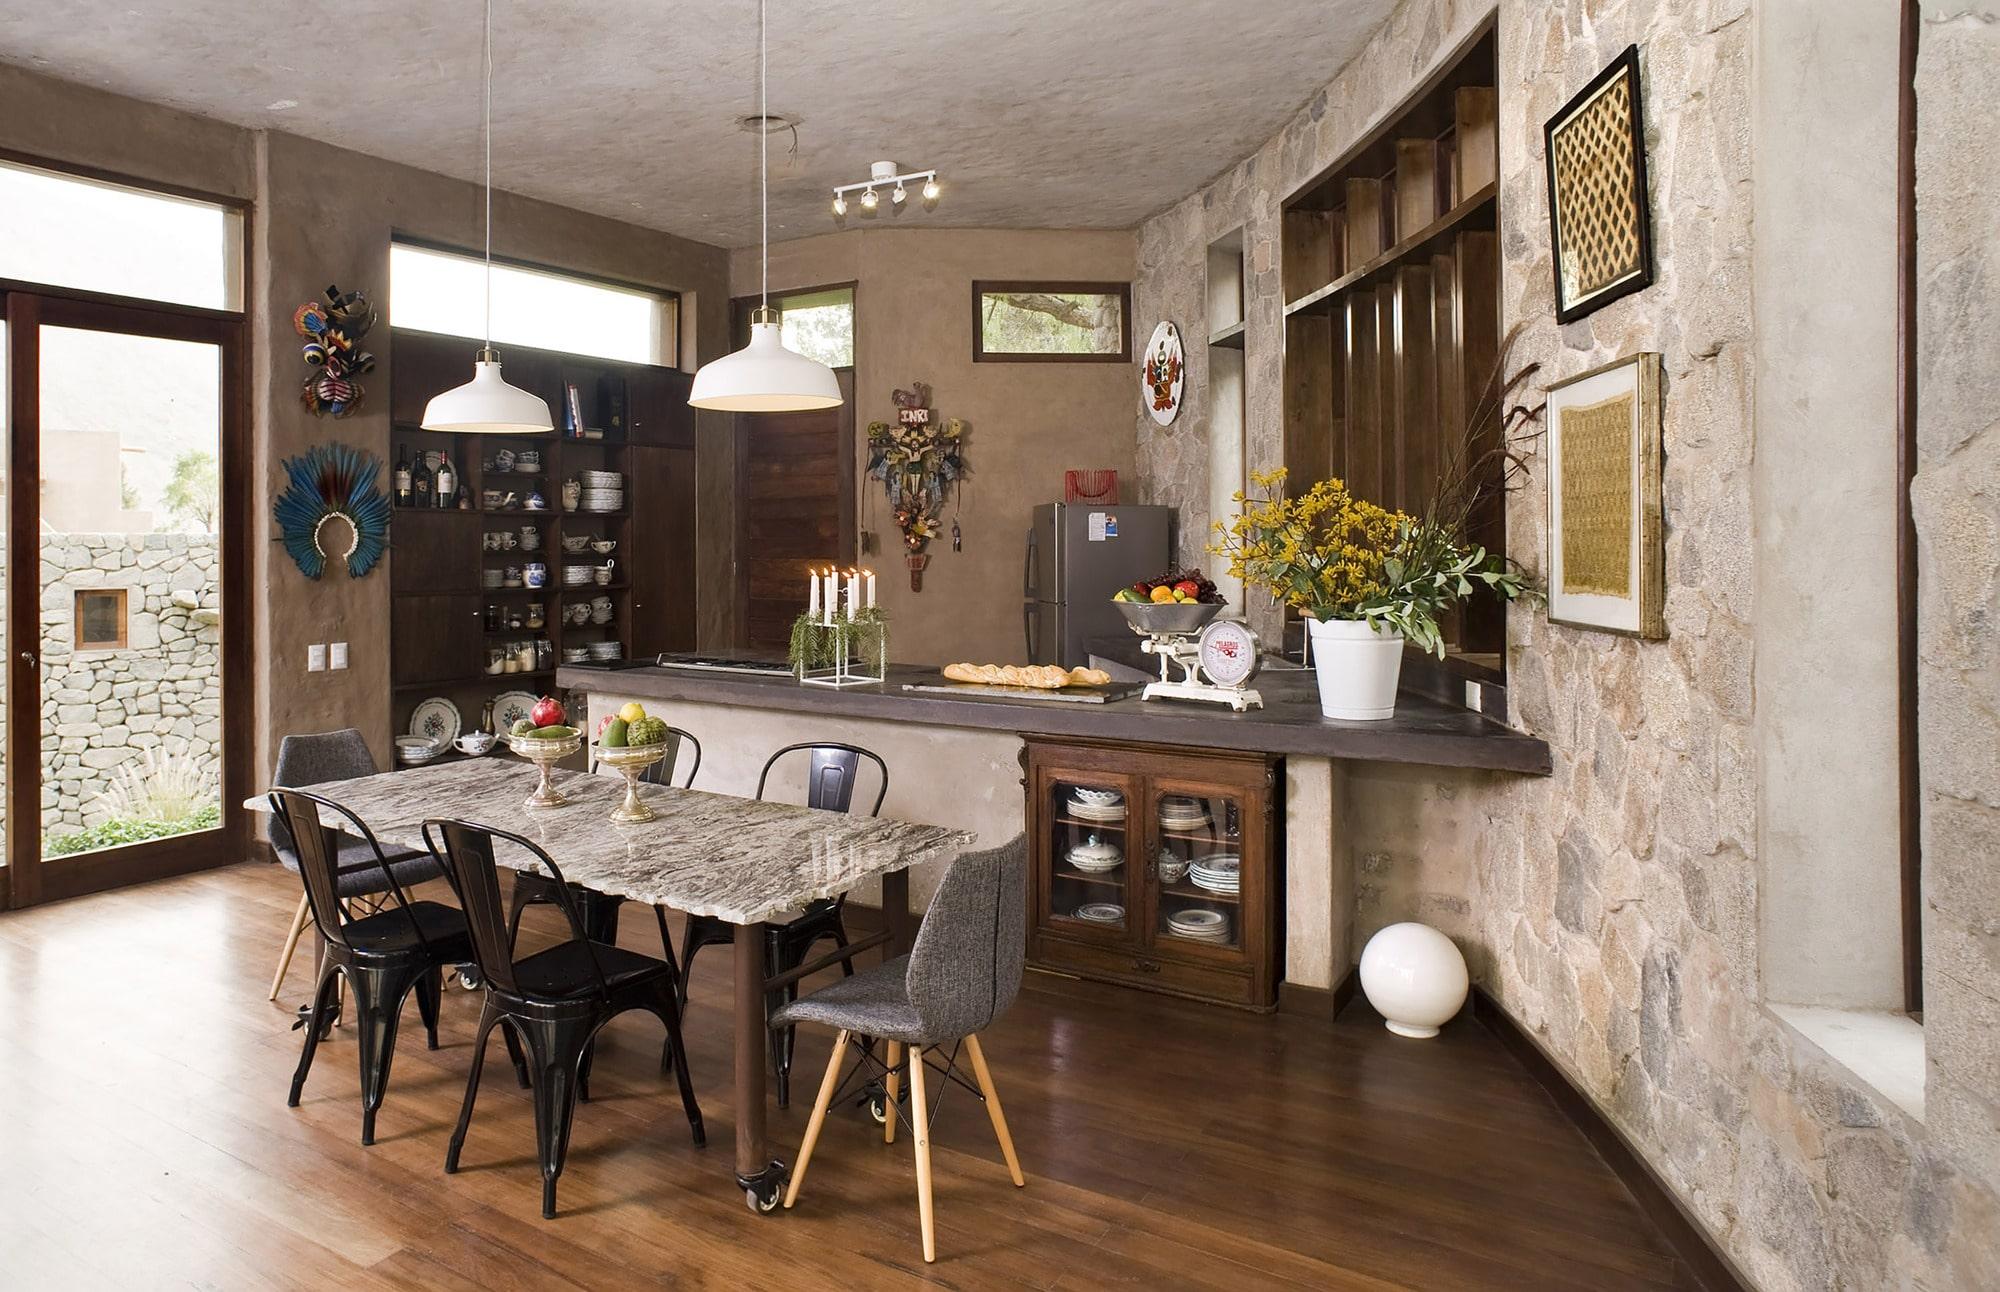 Dise o casa de campo tradicional construye hogar for Casa y ideas